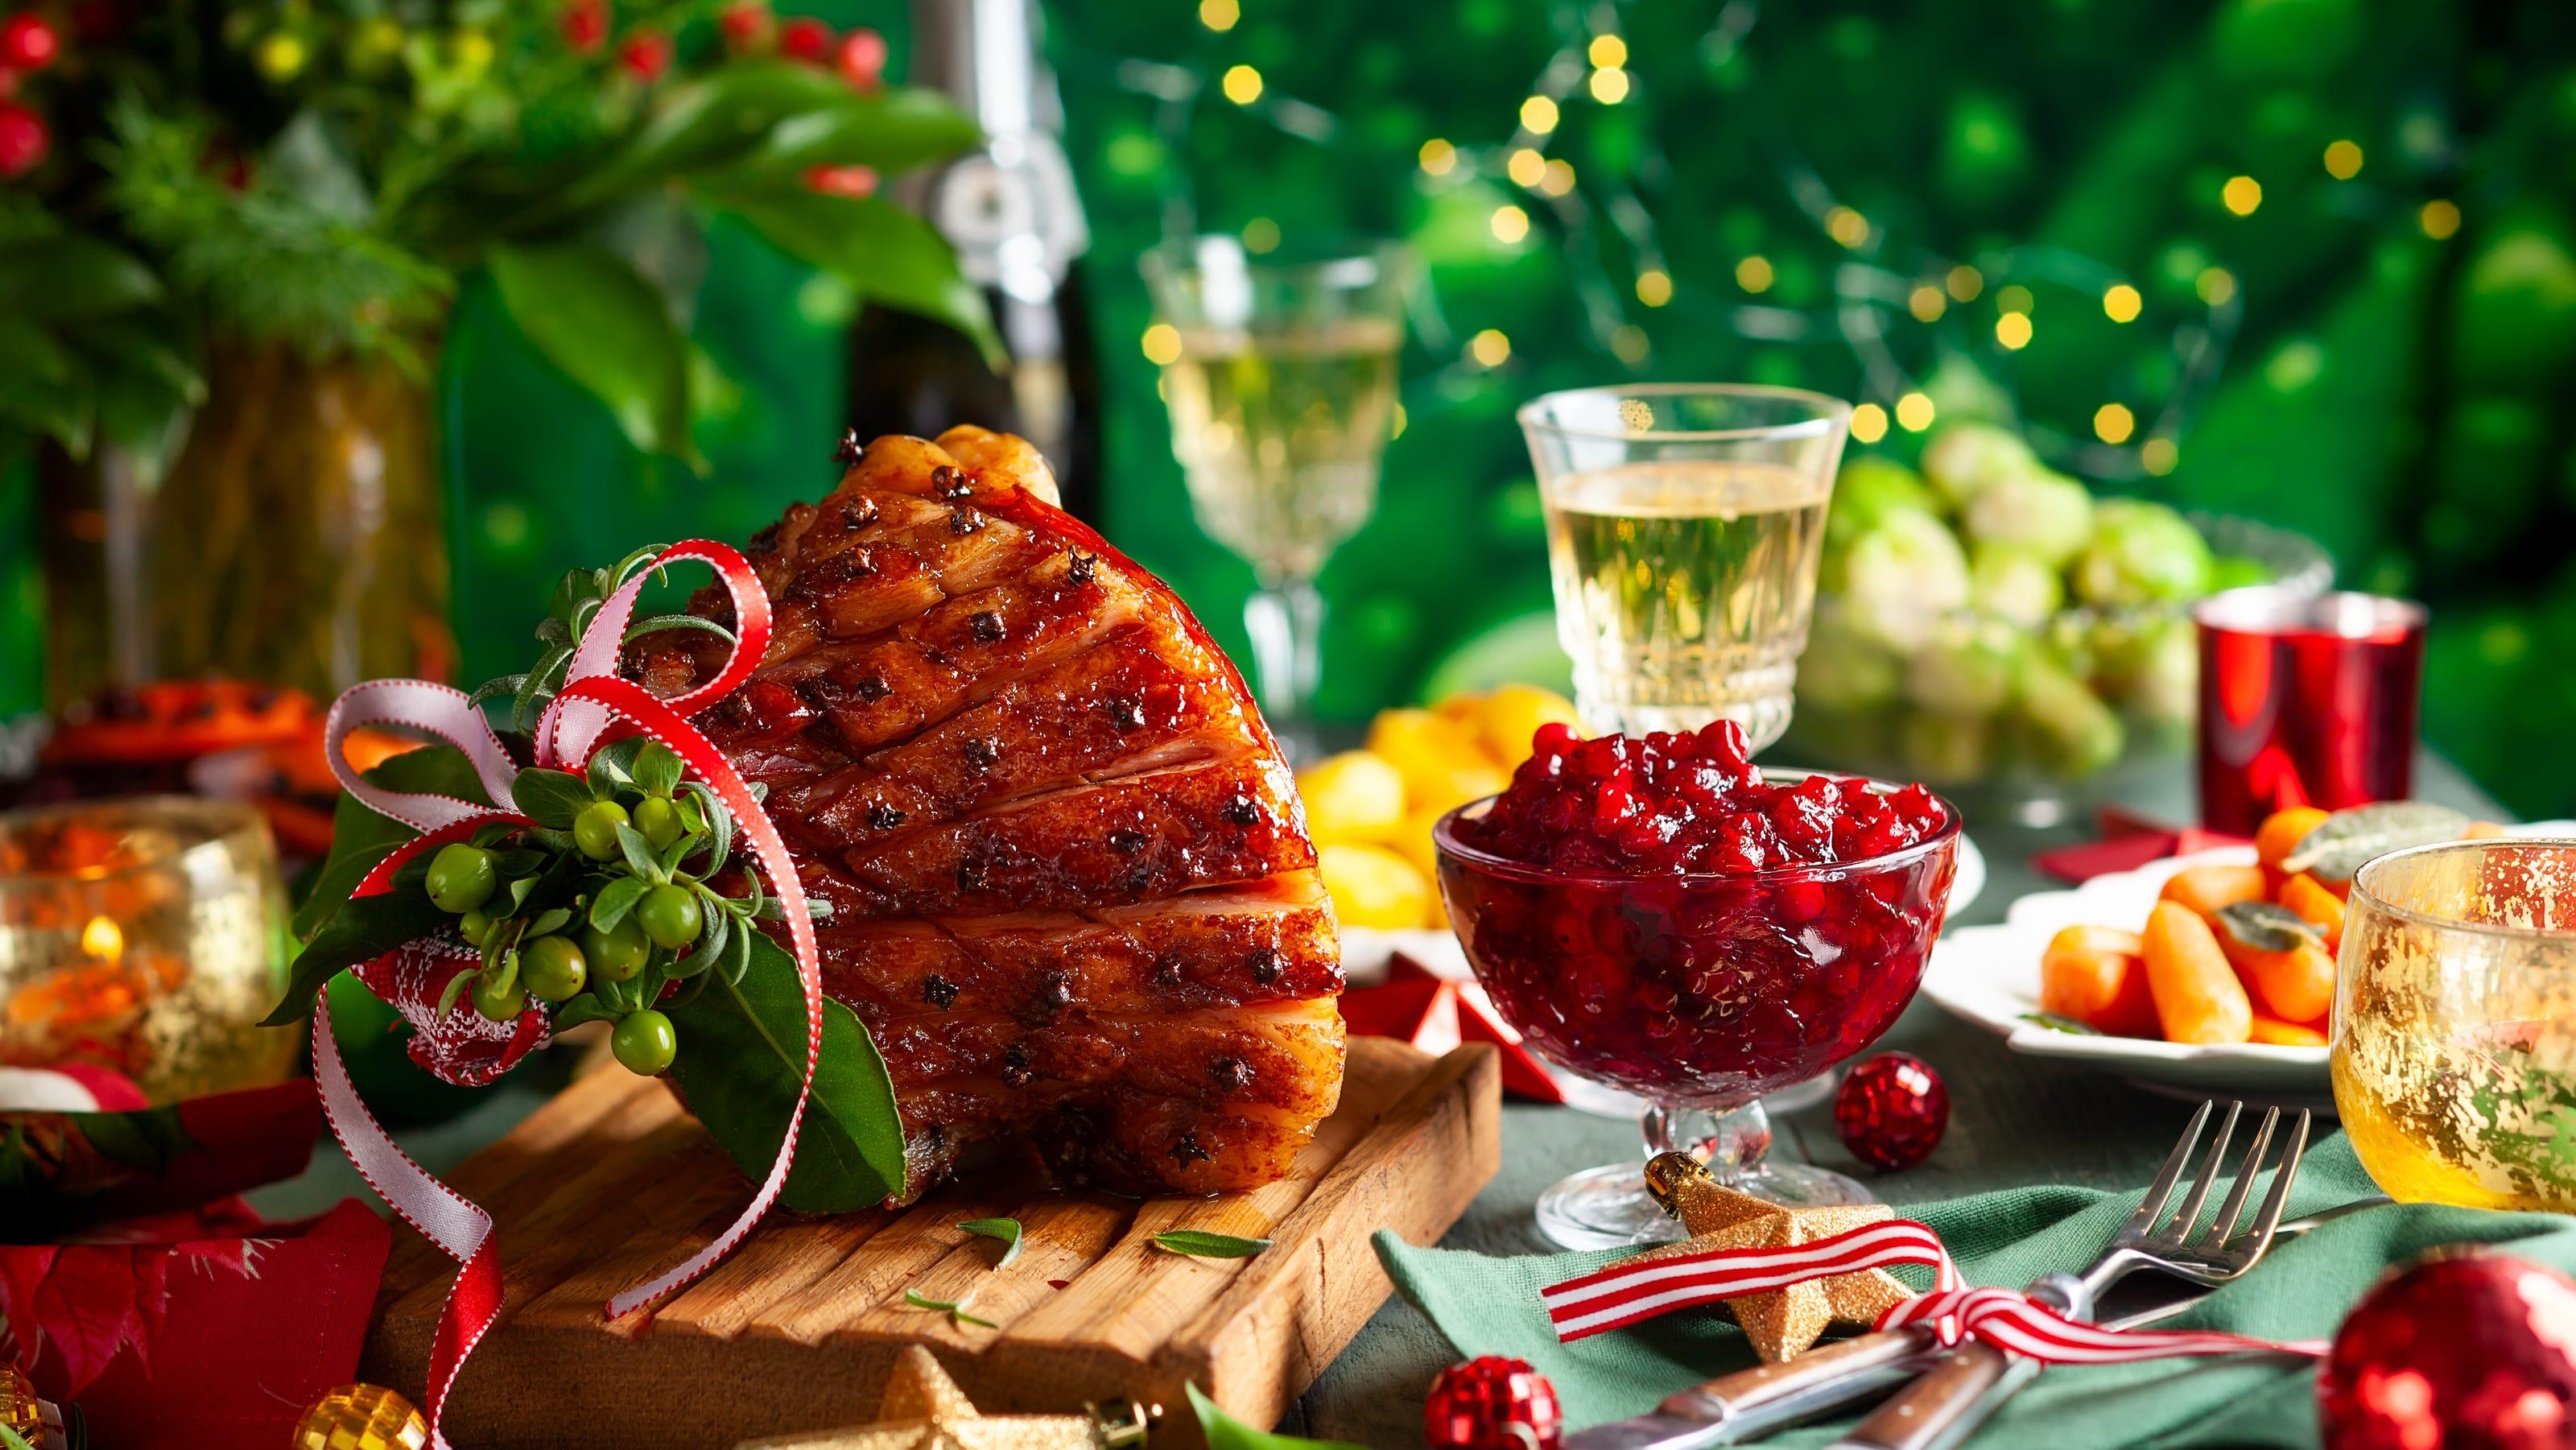 Restaurants Open Christmas Day Salem Oregon 2021 Where To Get Christmas Dinners What Restaurants Open And Treats To Go